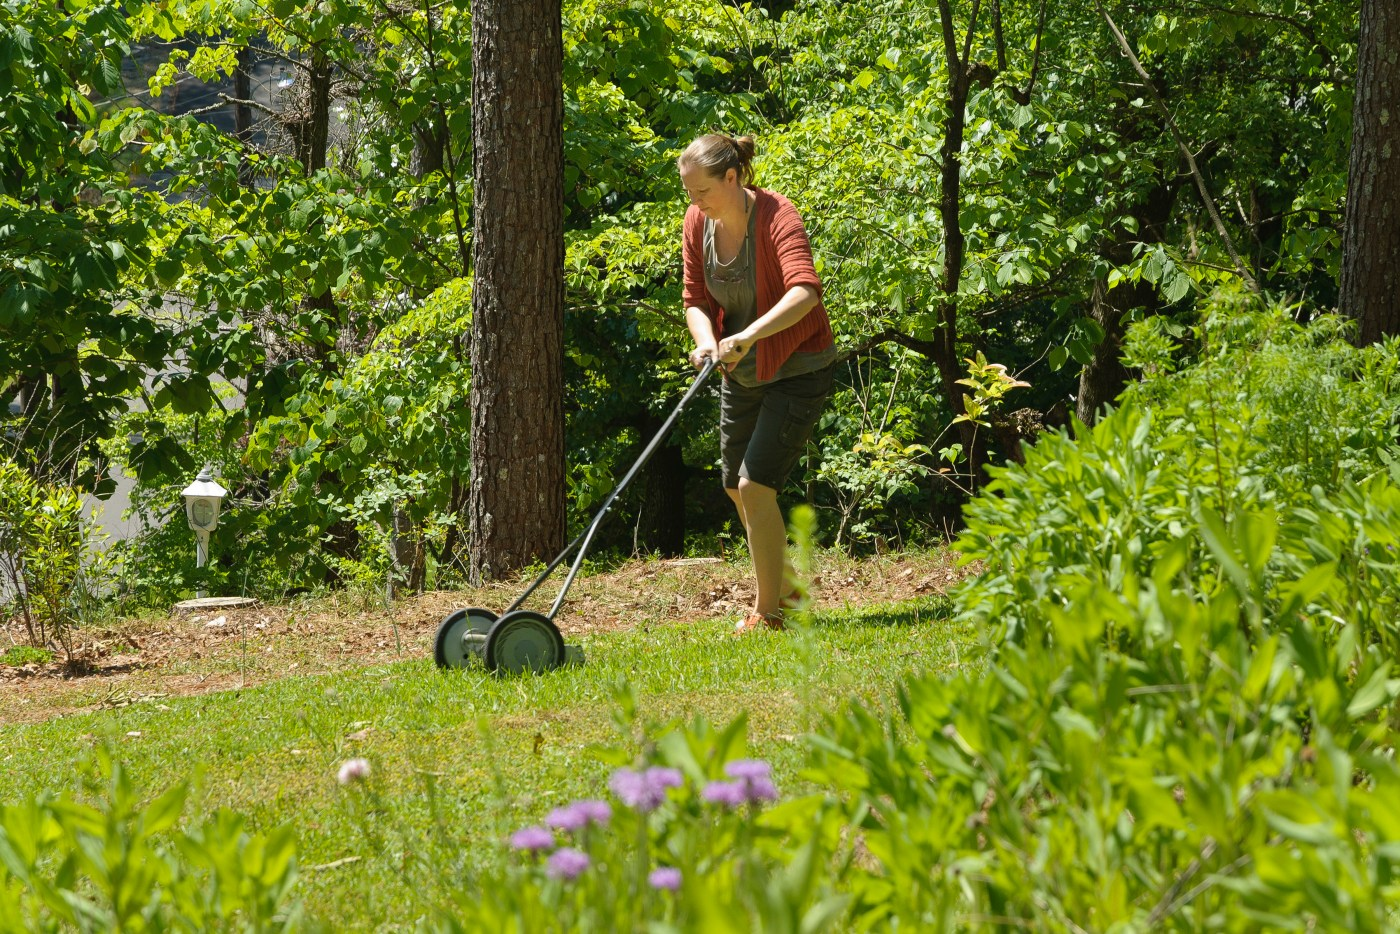 woman cutting grass, replace lawn